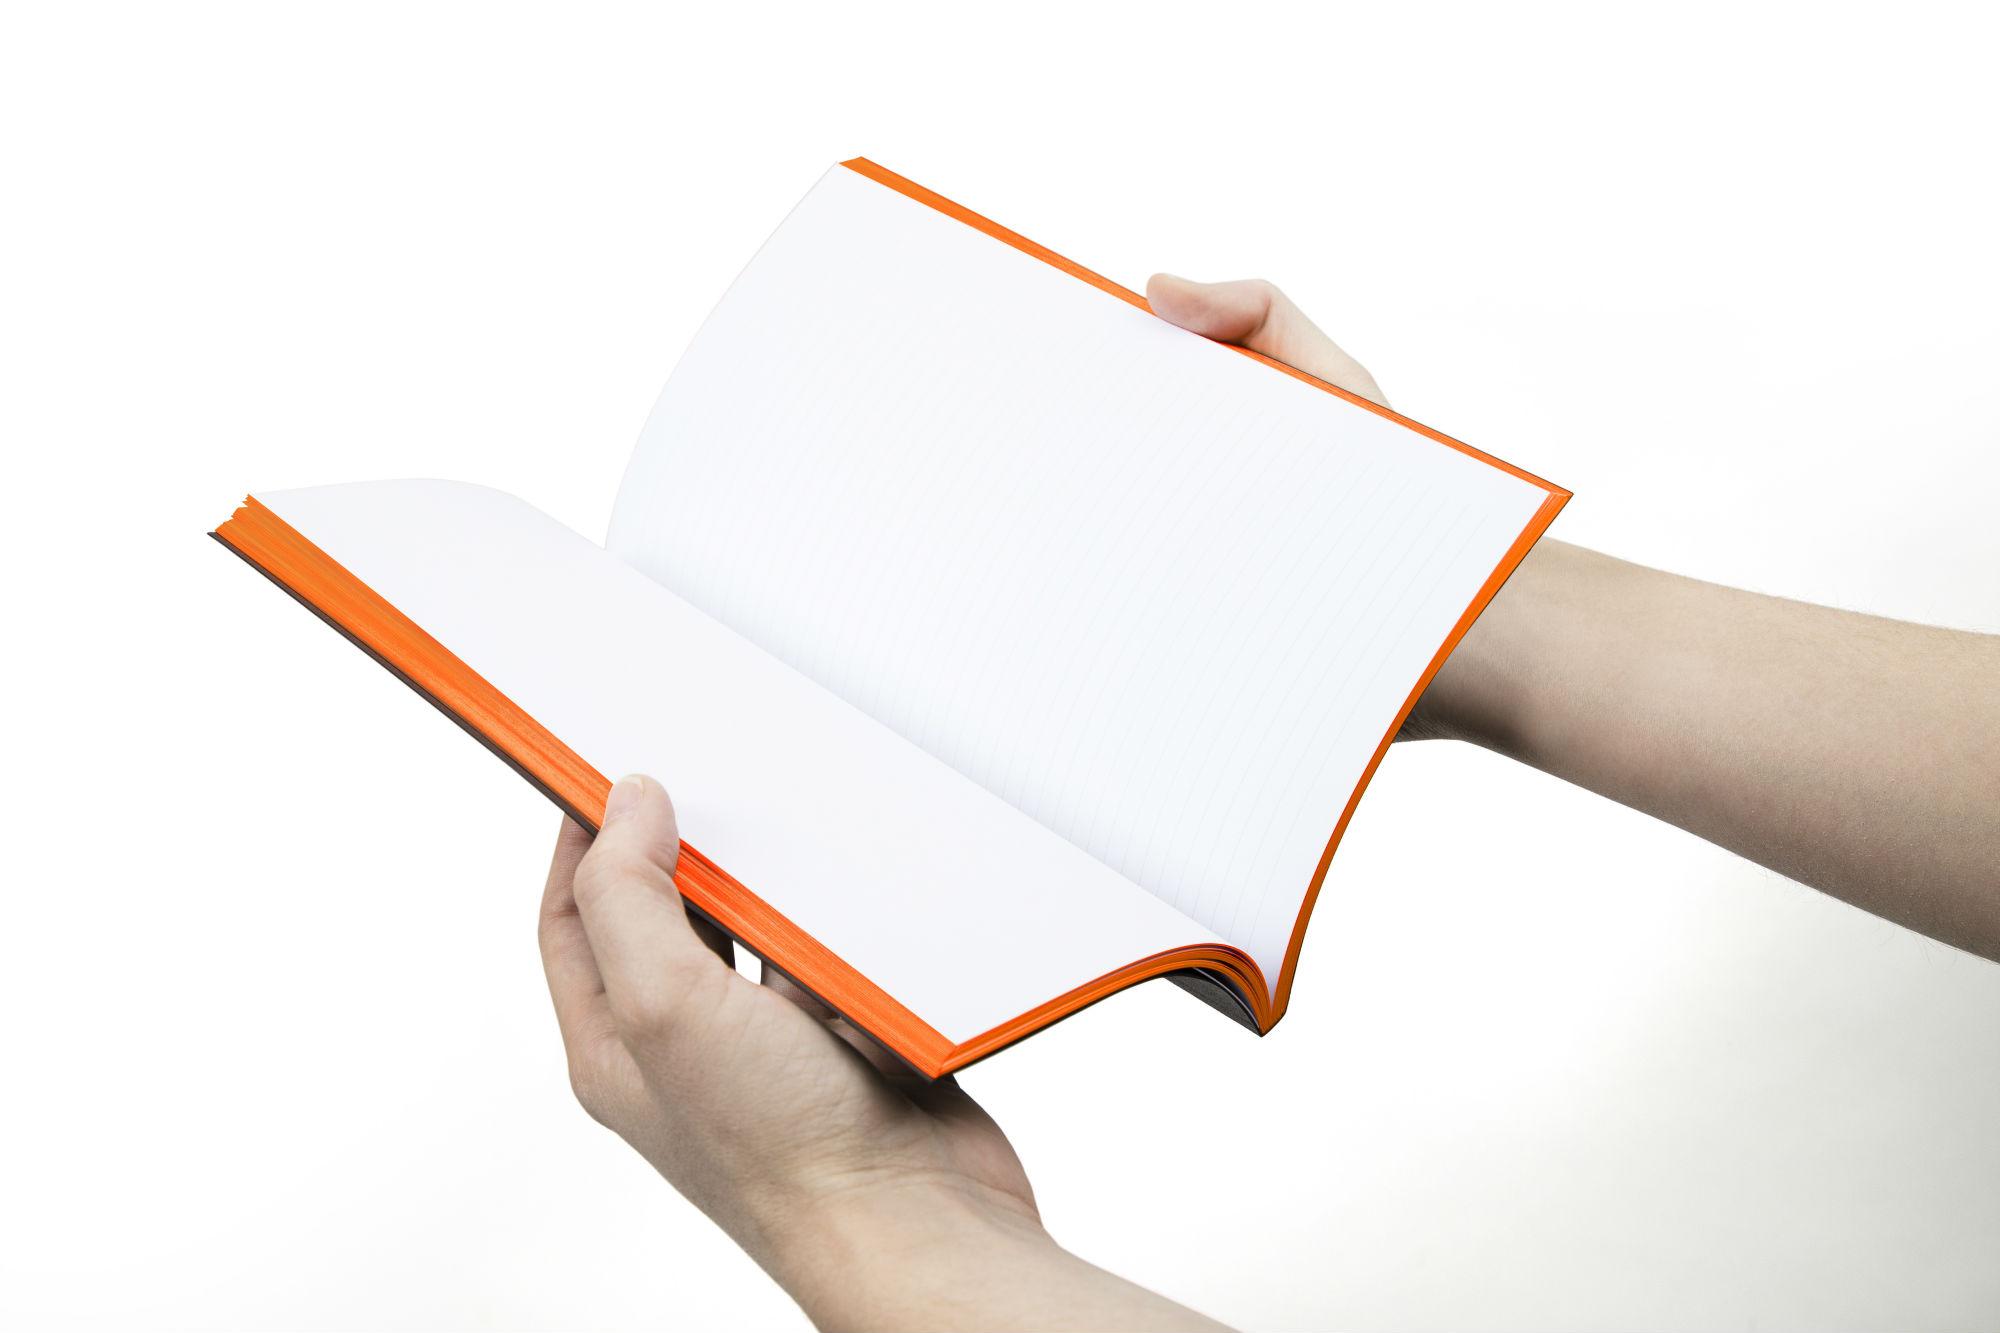 Carnet mypaperbook en main